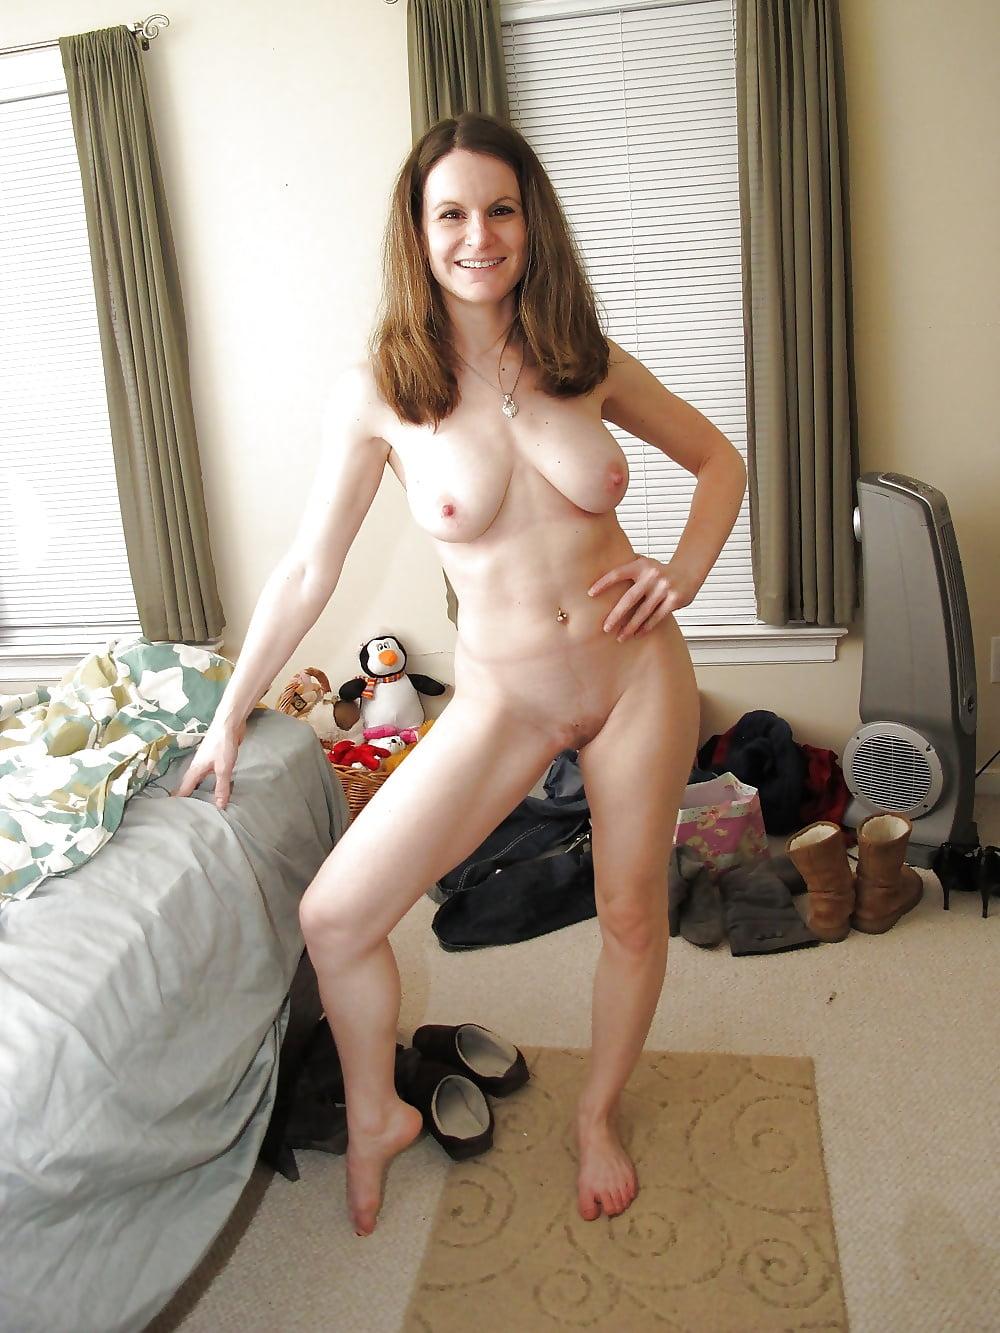 Amatheur canada nudes 4